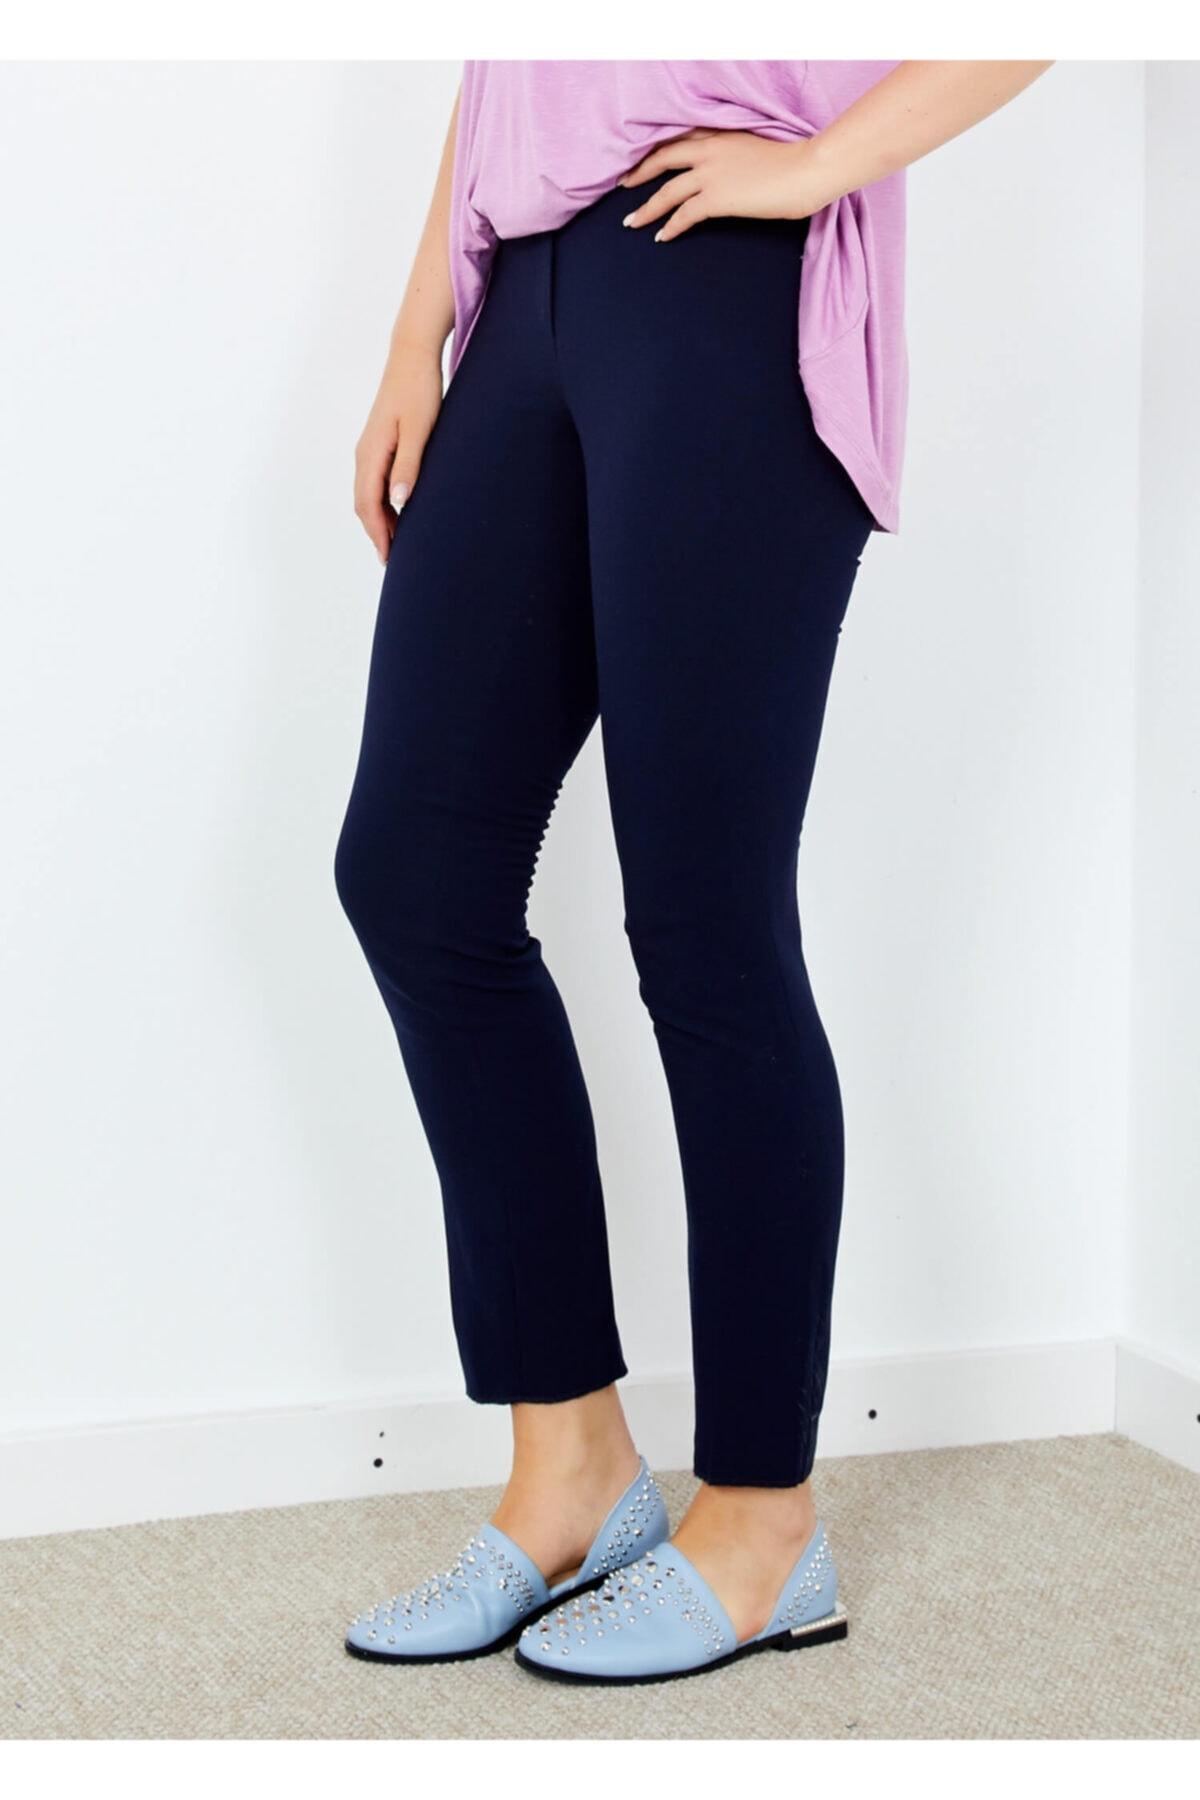 Adze Kadın Lacivert Klasik Kesim Boru Paça Pantalon 42 1